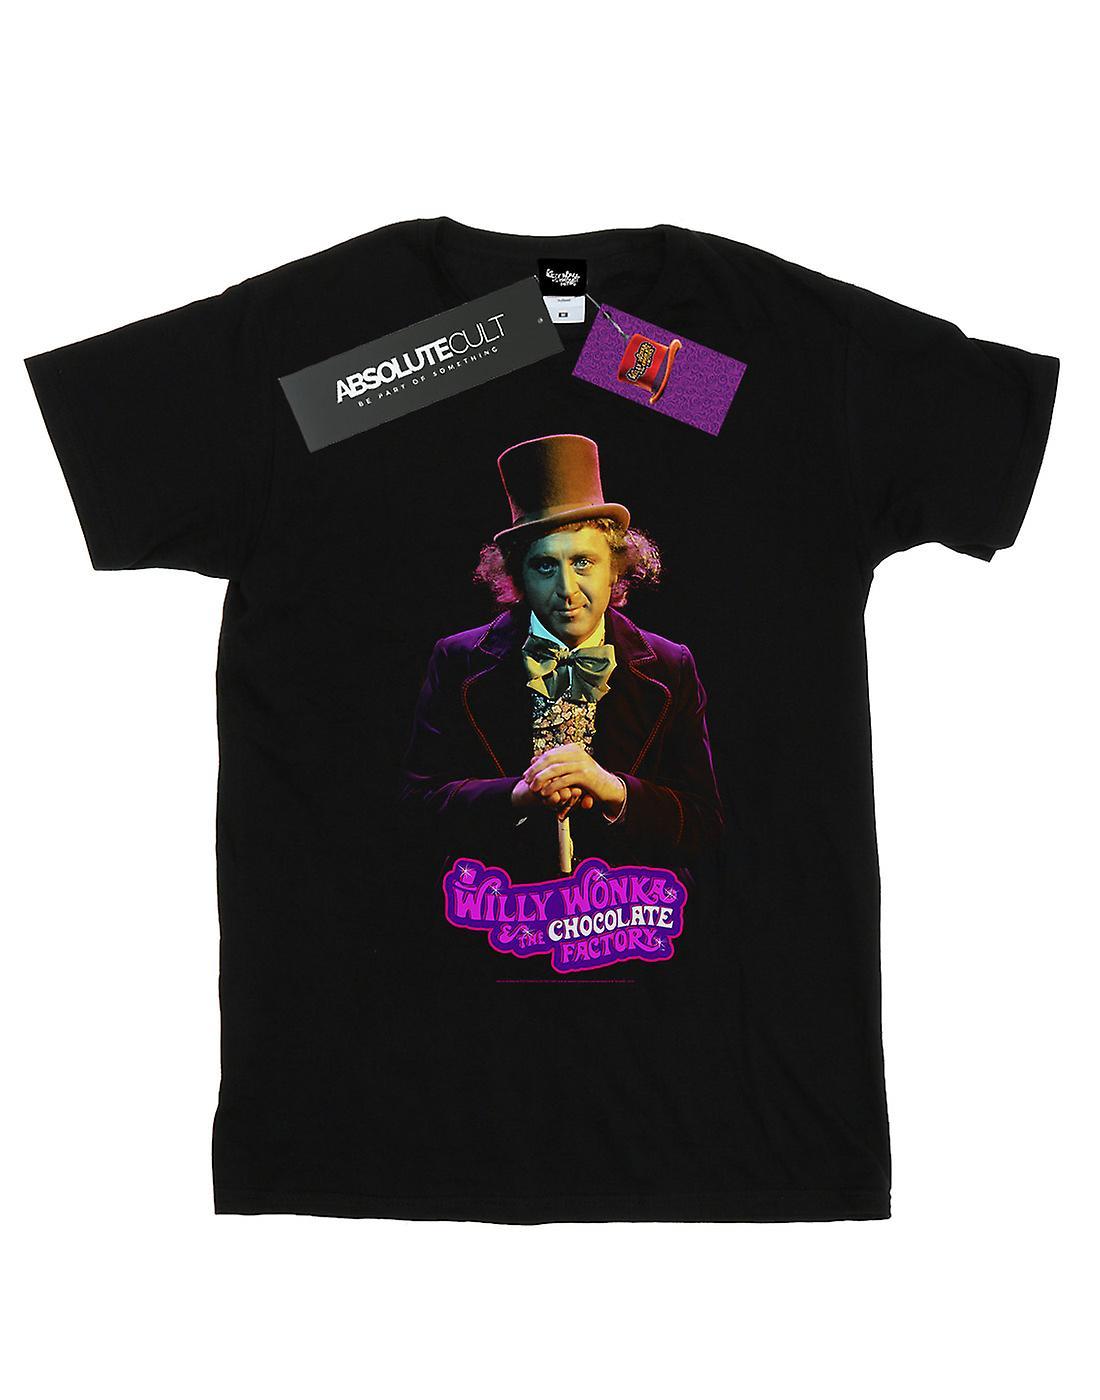 Willy Wonka And The Chocolate Factory Men's Dark Pose T-Shirt